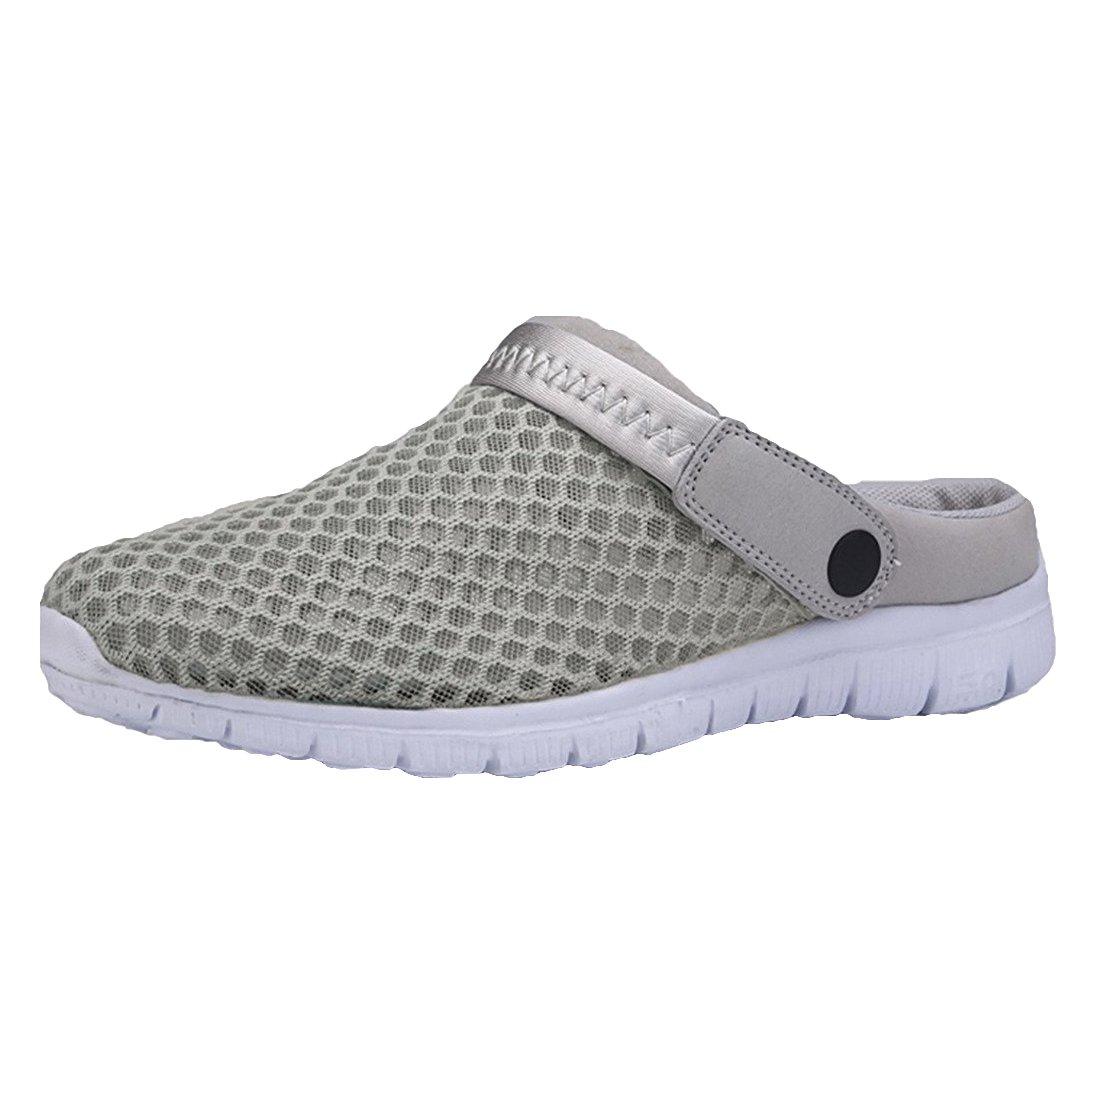 Hibote Unisex-Erwachsene Breathable Mesh Hausschuhe Sandalen Pantoletten Schuhe Pantoletten Schuhe Sommer r Loch Sandalen/zu Fuszlig;/Anti-Slip Beach Sandalen  44 EU|Grau